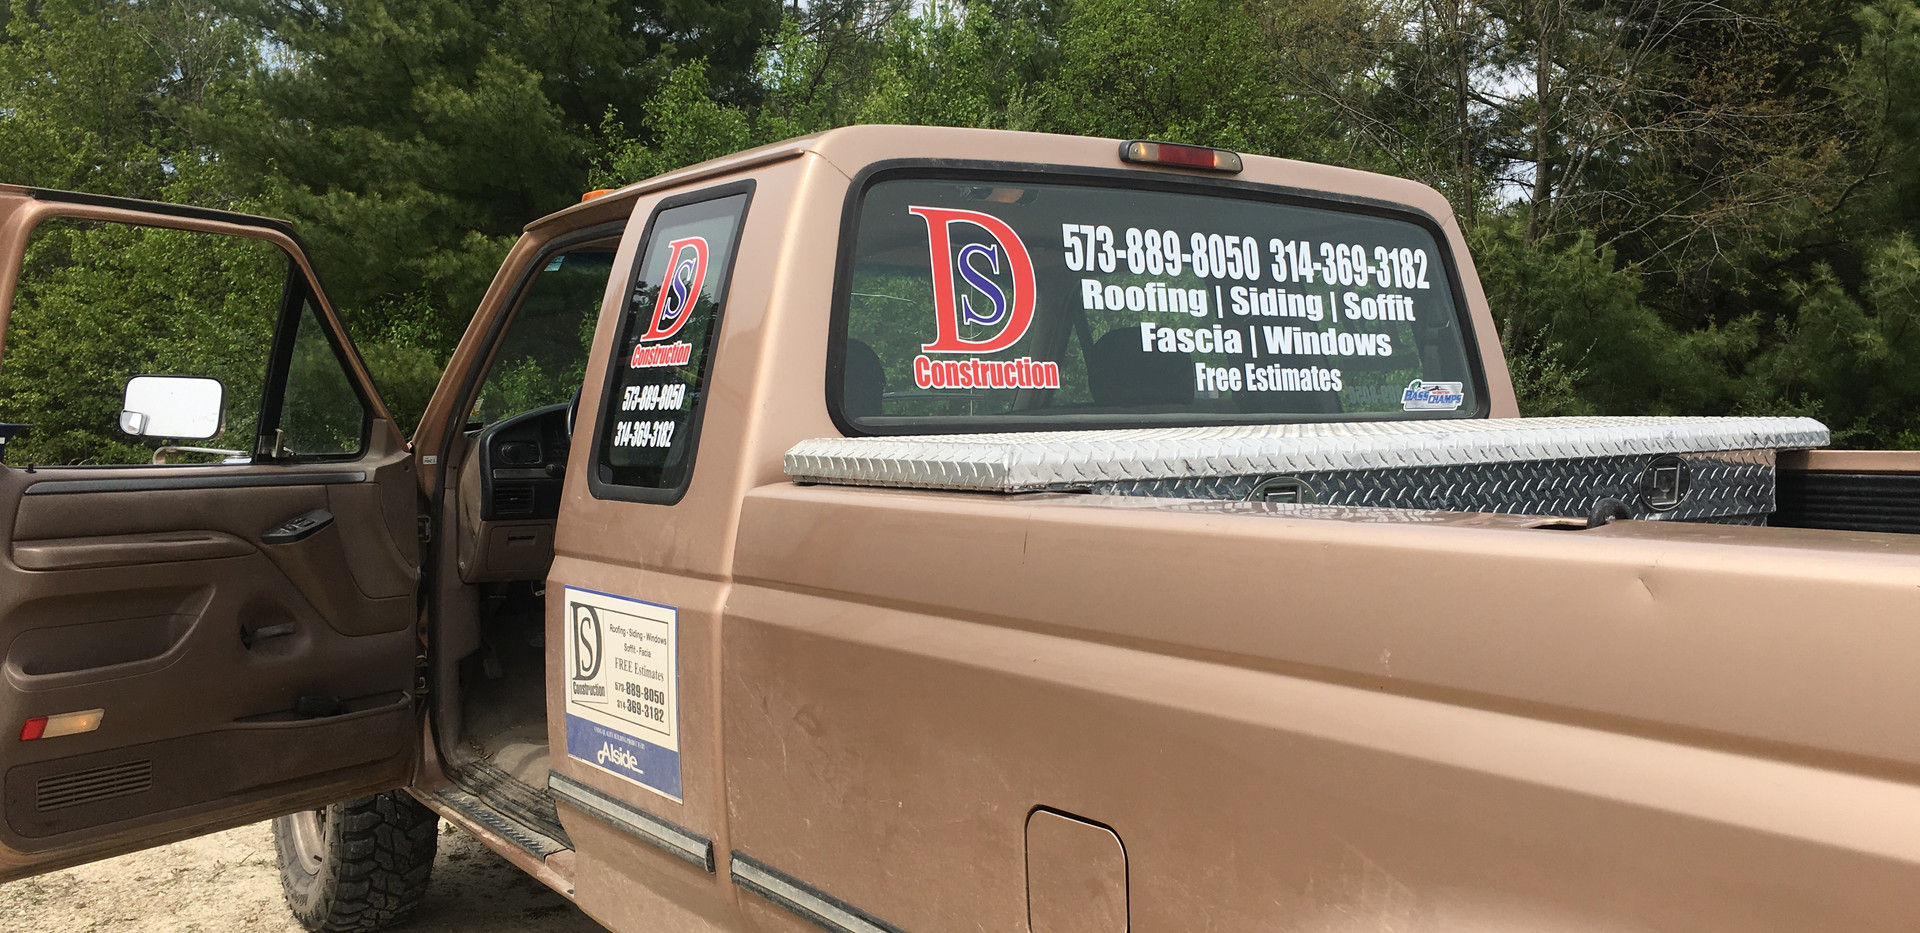 DS Construction Window Graphics